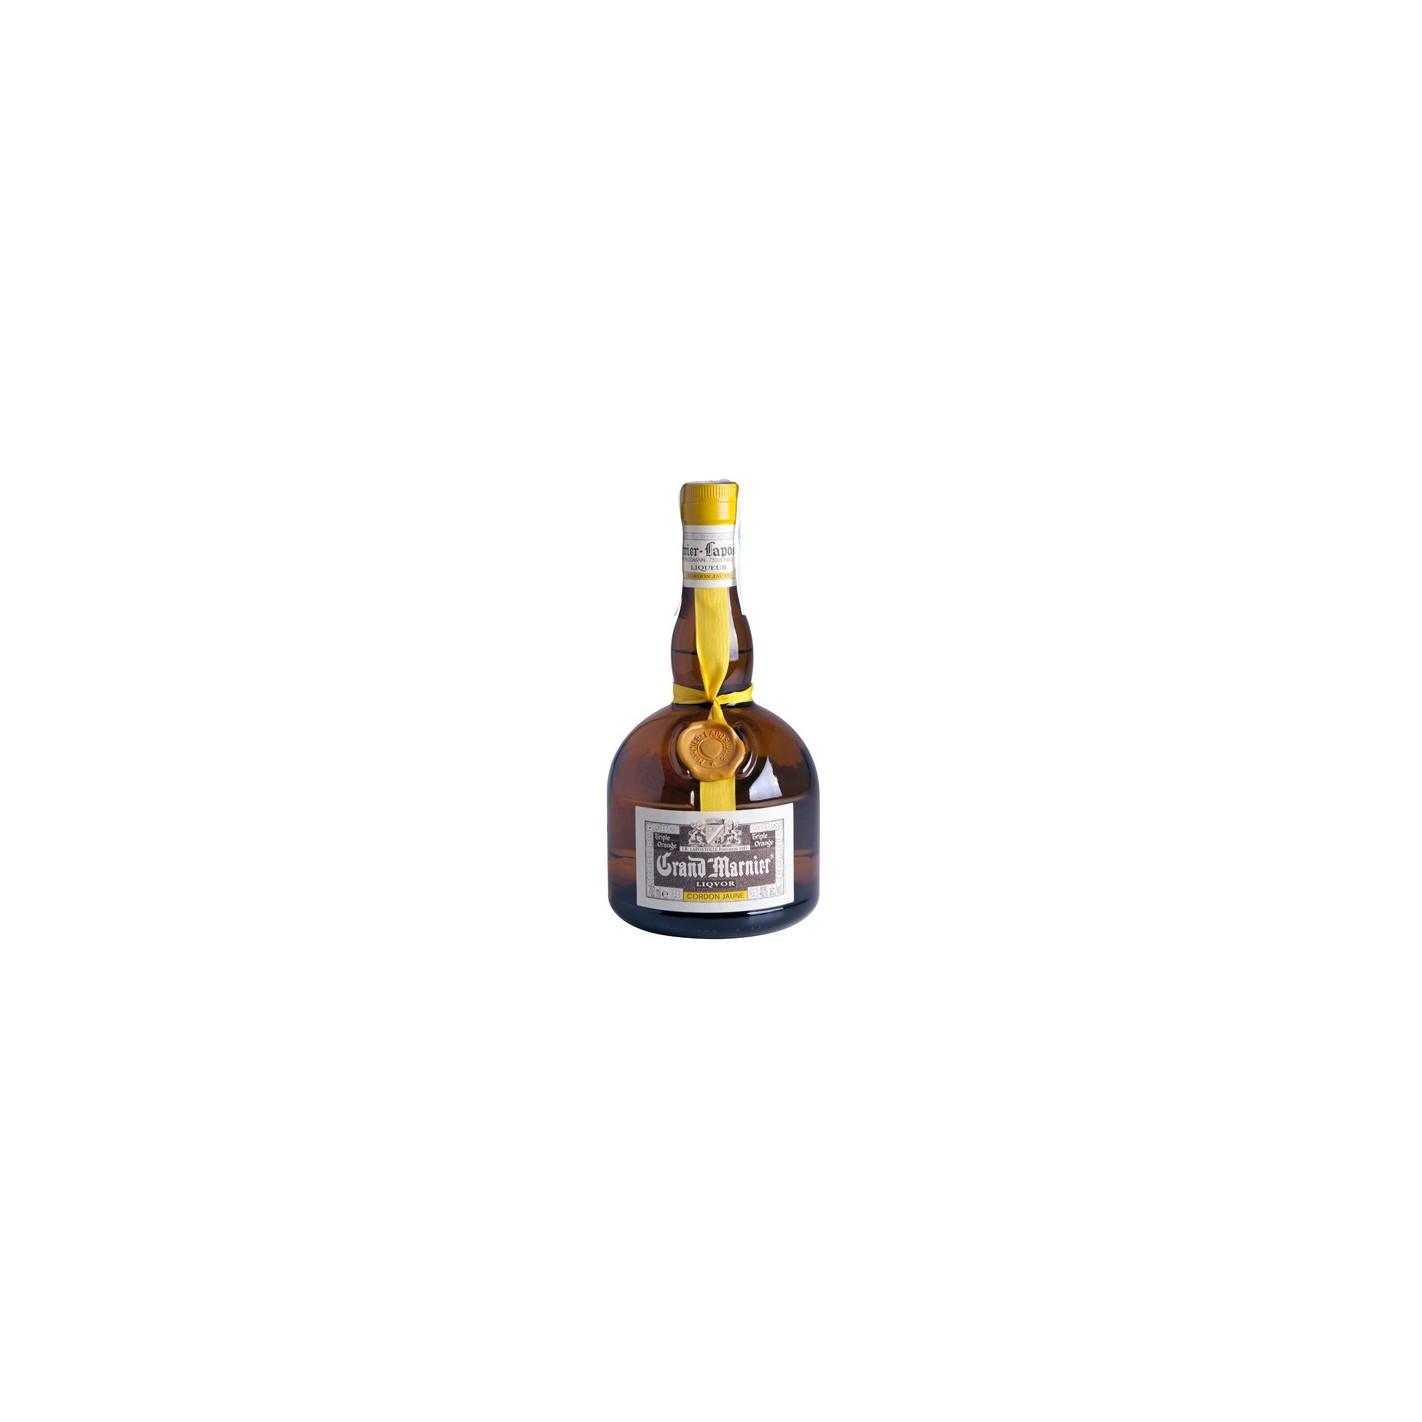 Grand marnier cordon jaune licores y destilados for Grand marnier cordon jaune aldi